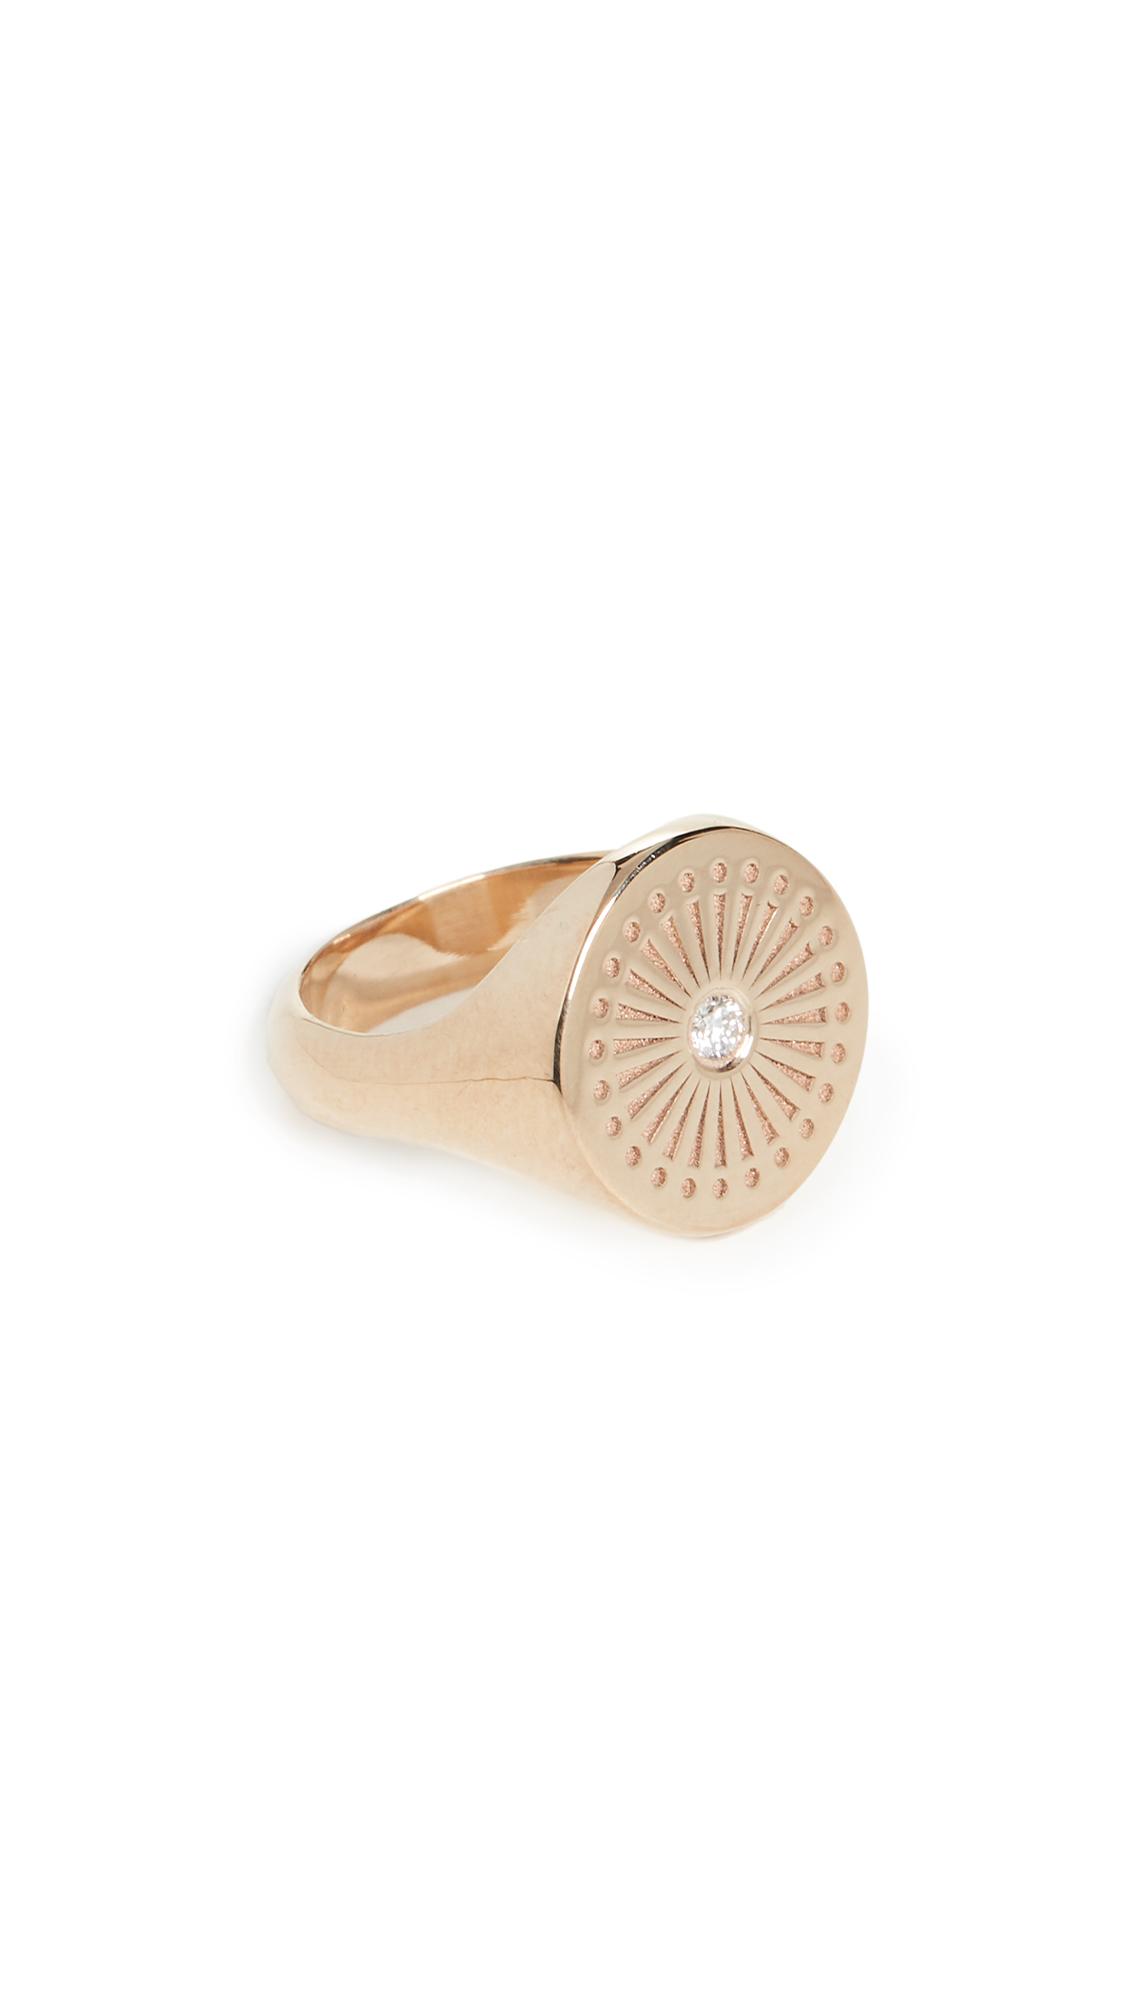 ZoË Chicco 14K Gold Sunbeam Signet Ring In Yellow